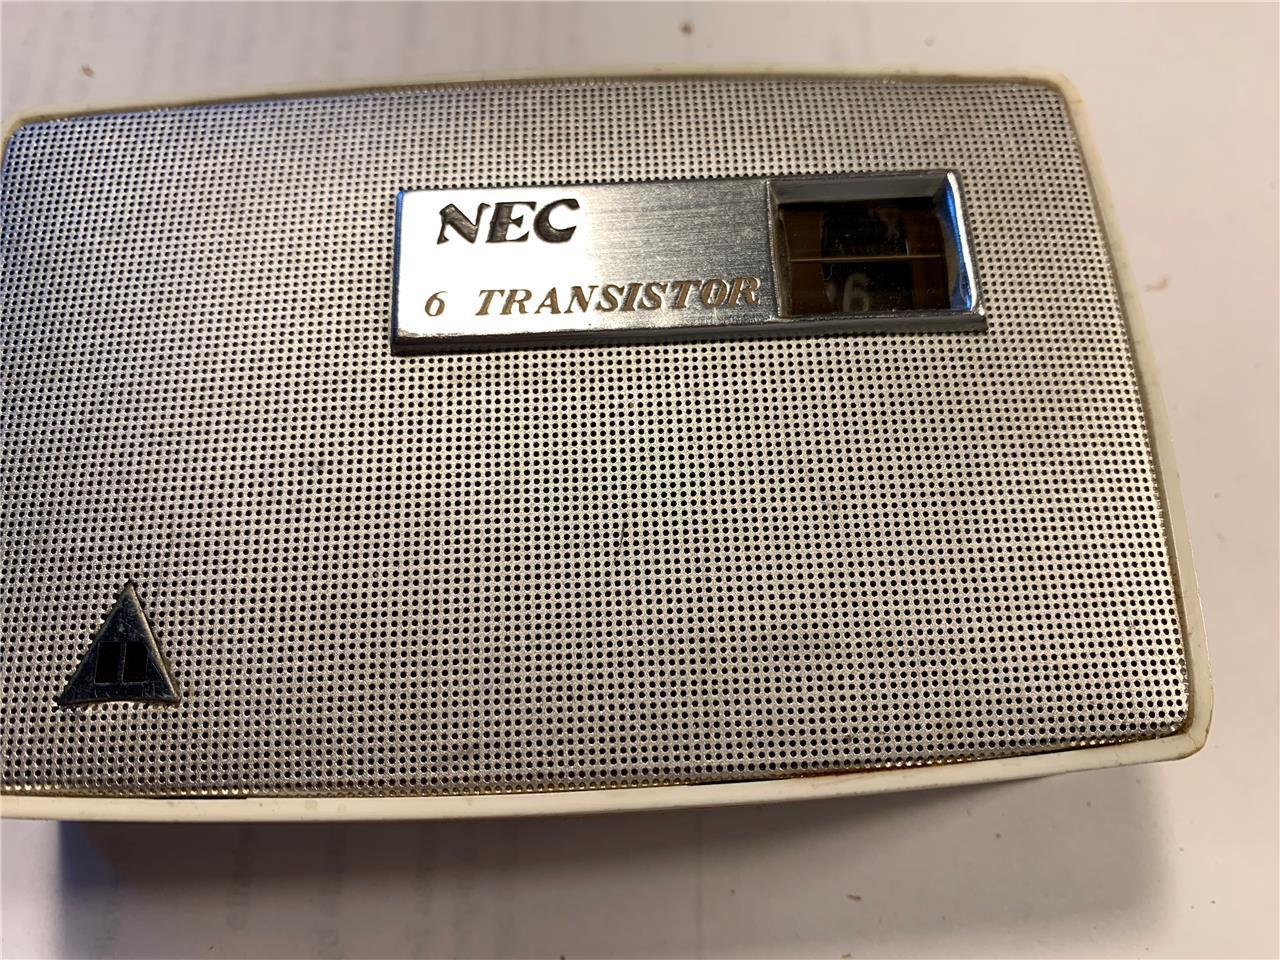 D7538C NEC INTEGRATED CIRCUIT NOS 1PC New Old Stock C535BU7F100718